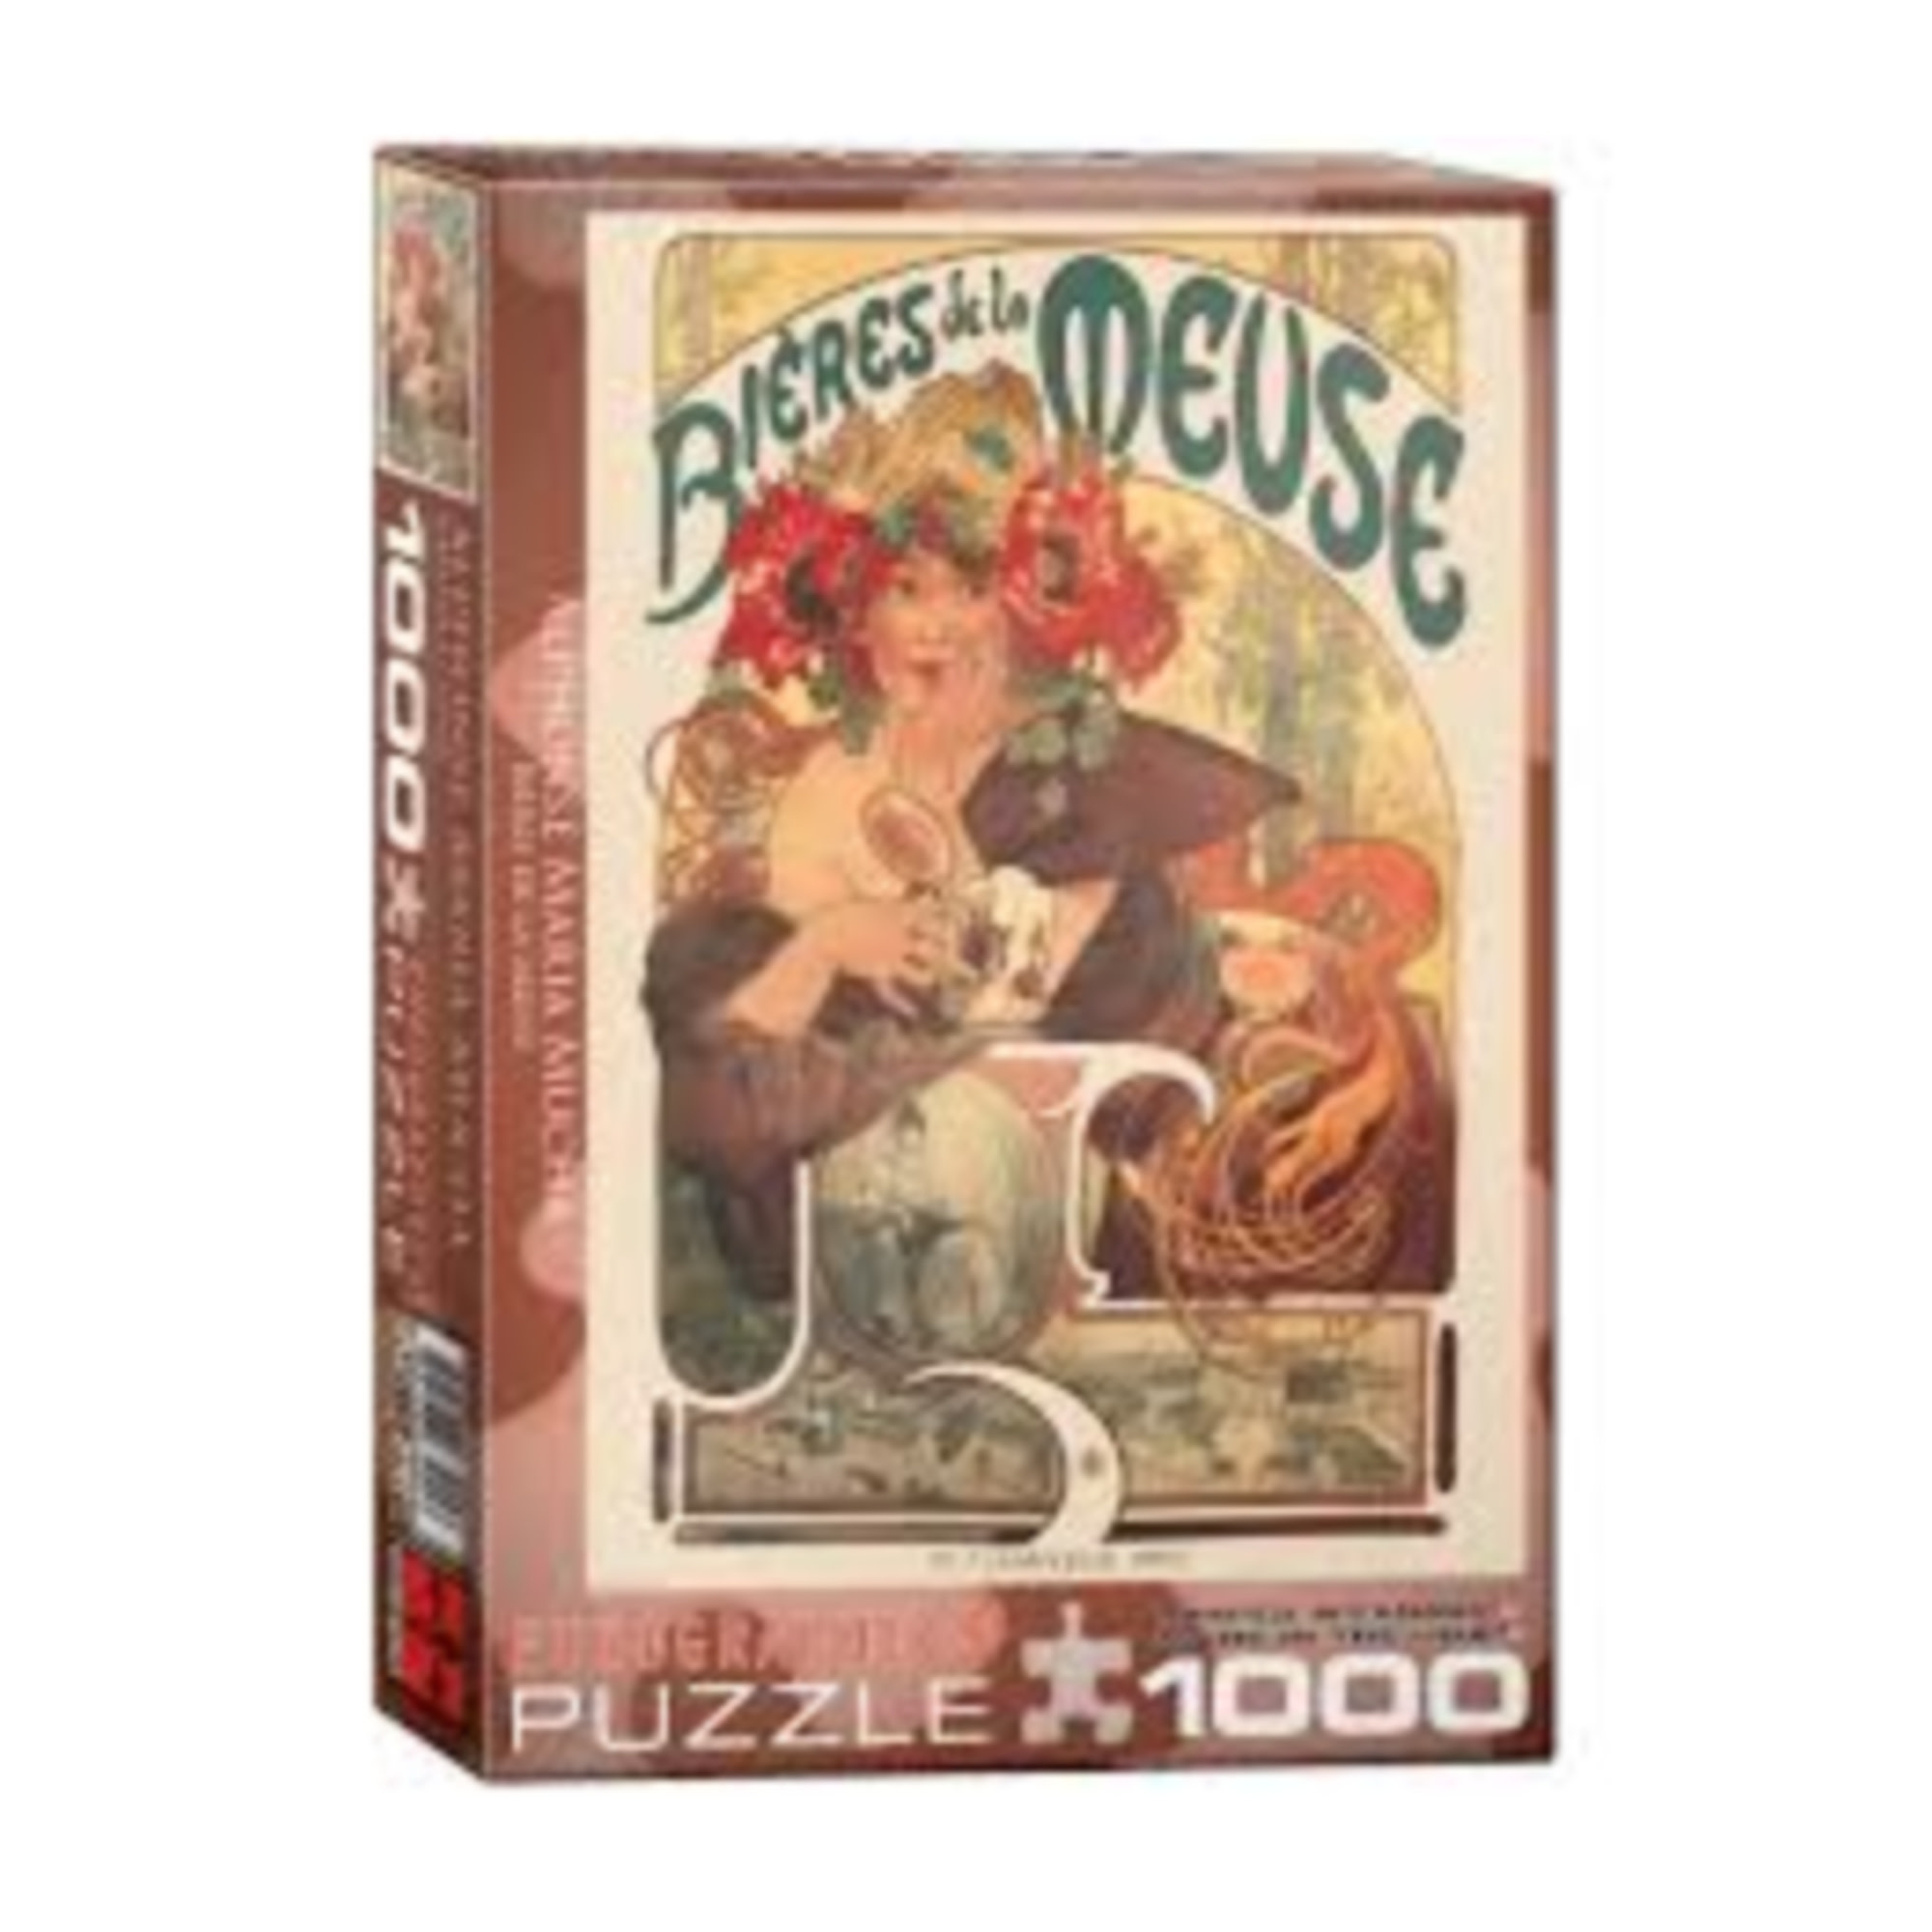 Eurographics Puzzle 1000: Bieres de la Meuse / Alphonse Maria Mucha